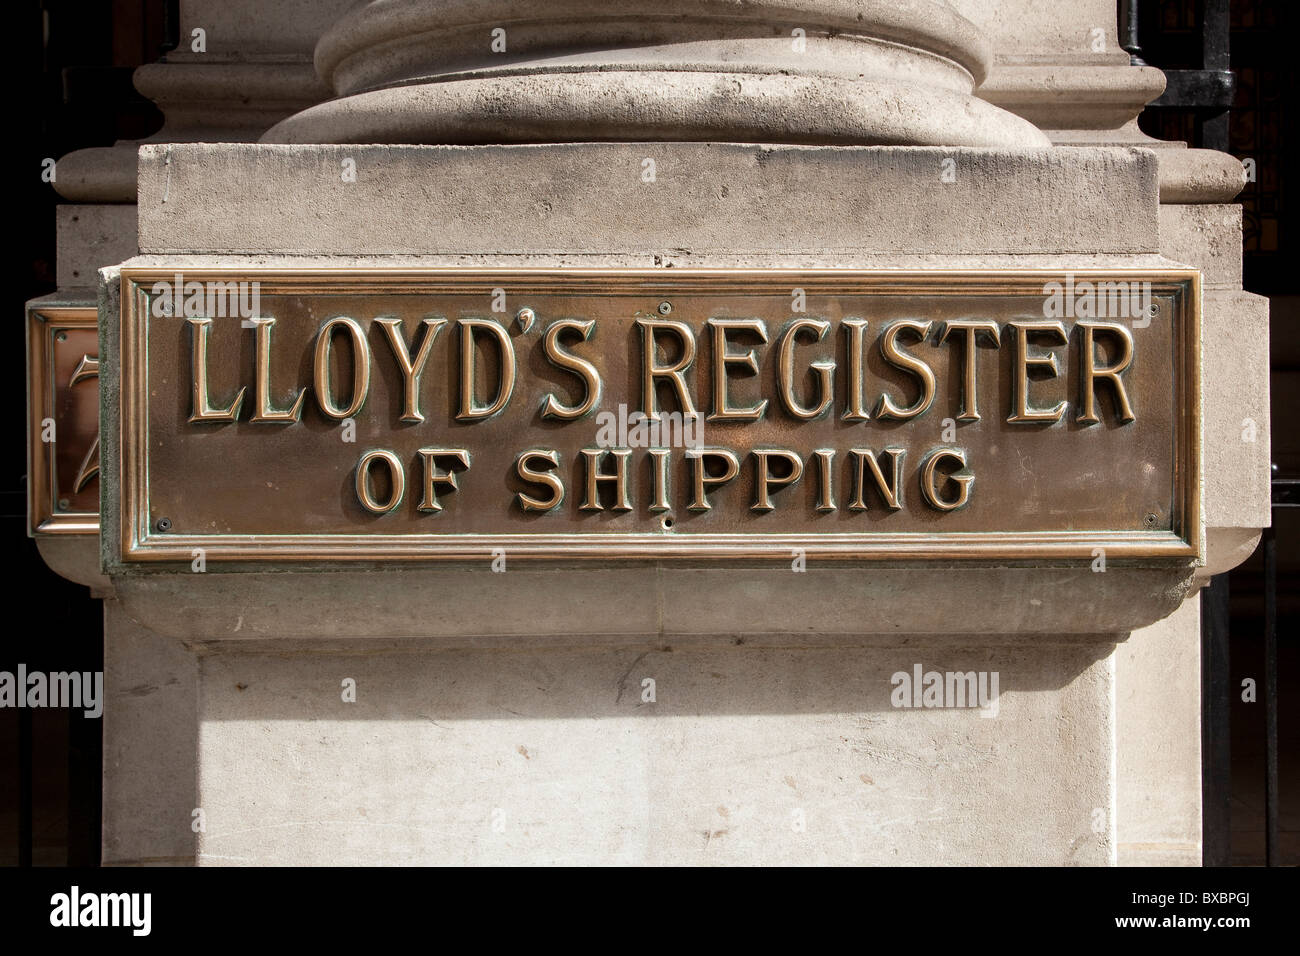 Lettering, Lloyds Register of Shipping, London, England, United Kingdom, Europe - Stock Image